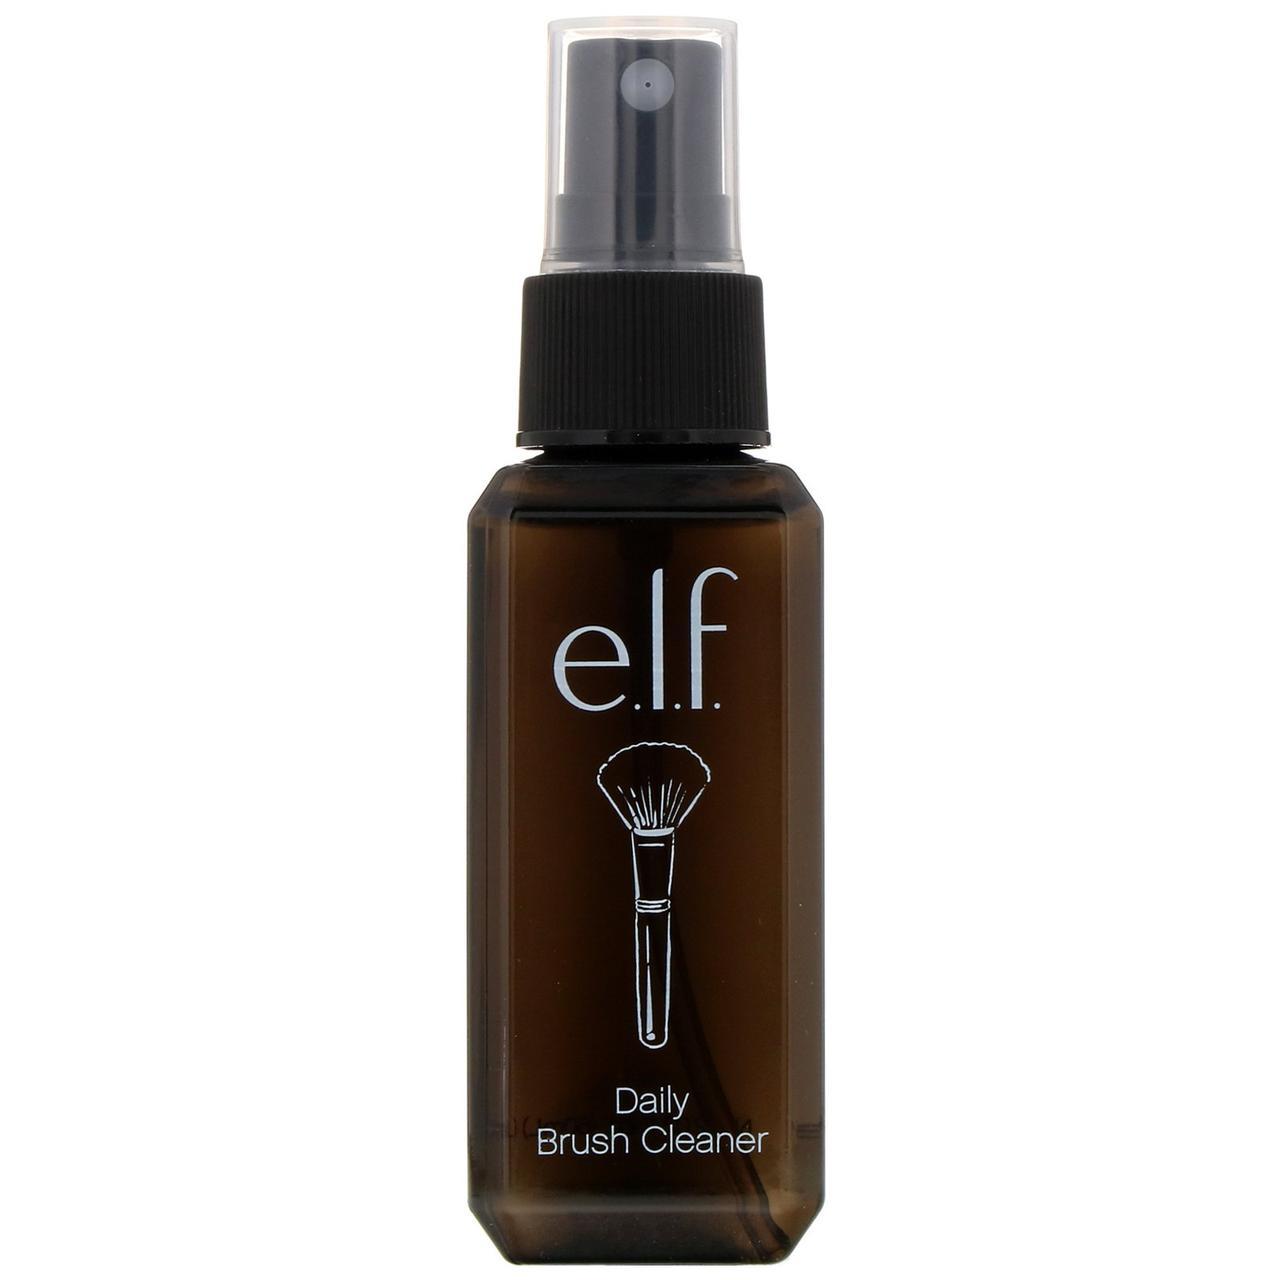 E.L.F. Cosmetics, Средство для ежедневной чистки кистей, прозрачное, 2,02 жидкой унции (60 мл)